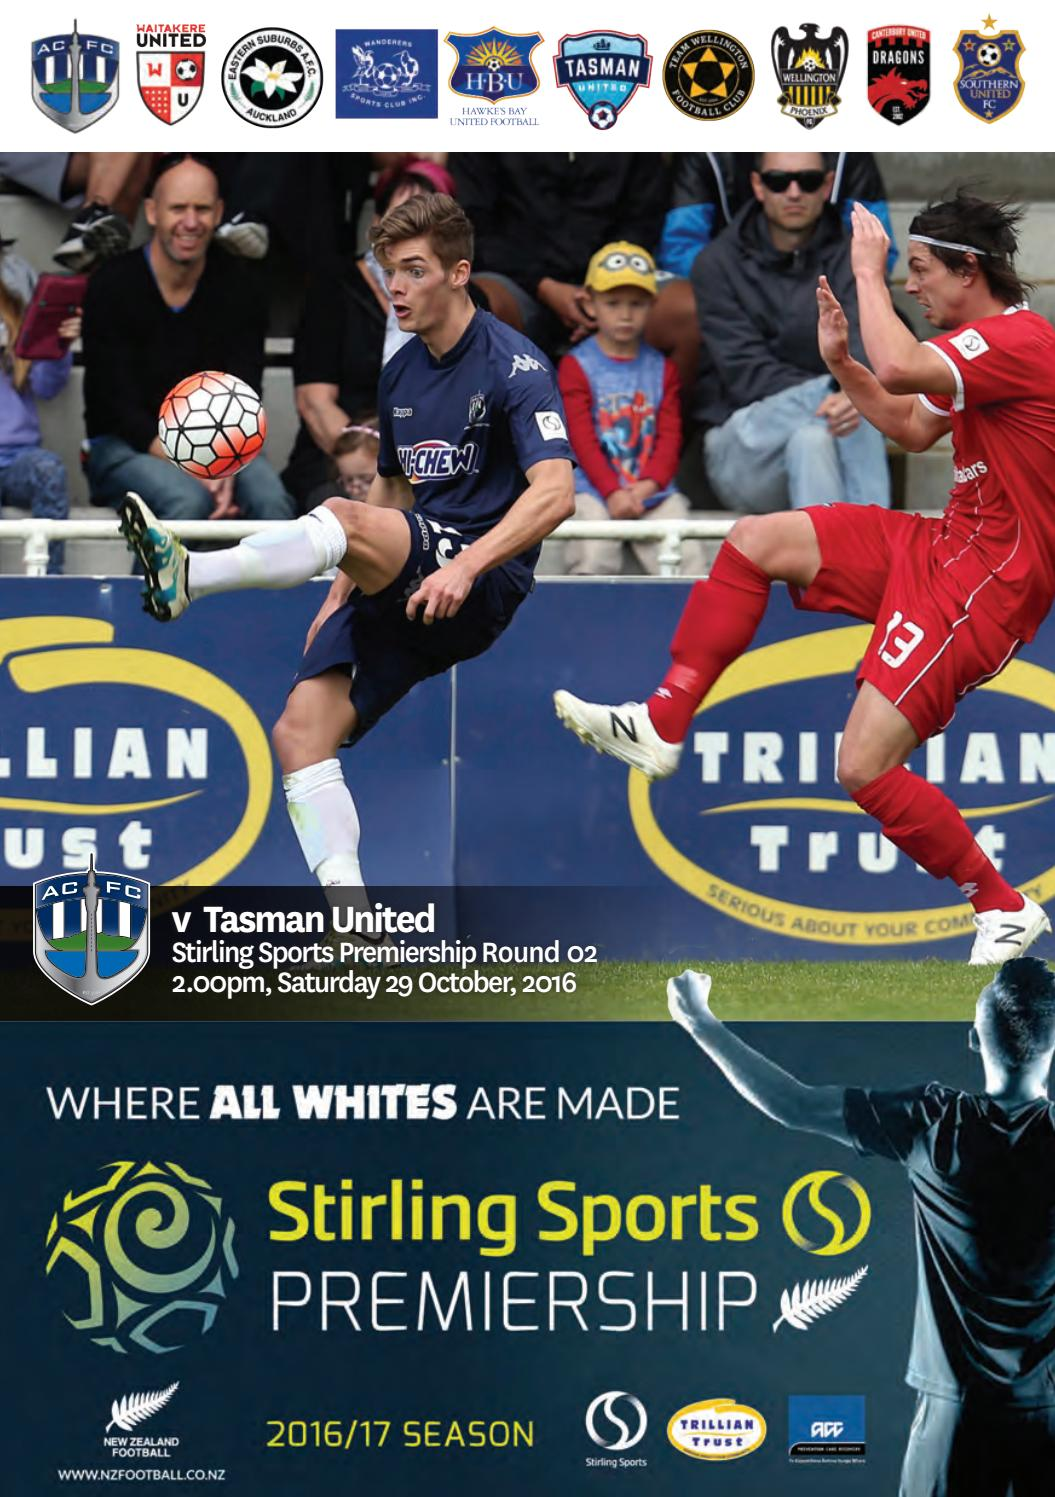 Match Programme Auckland City Fc V Tasman United By